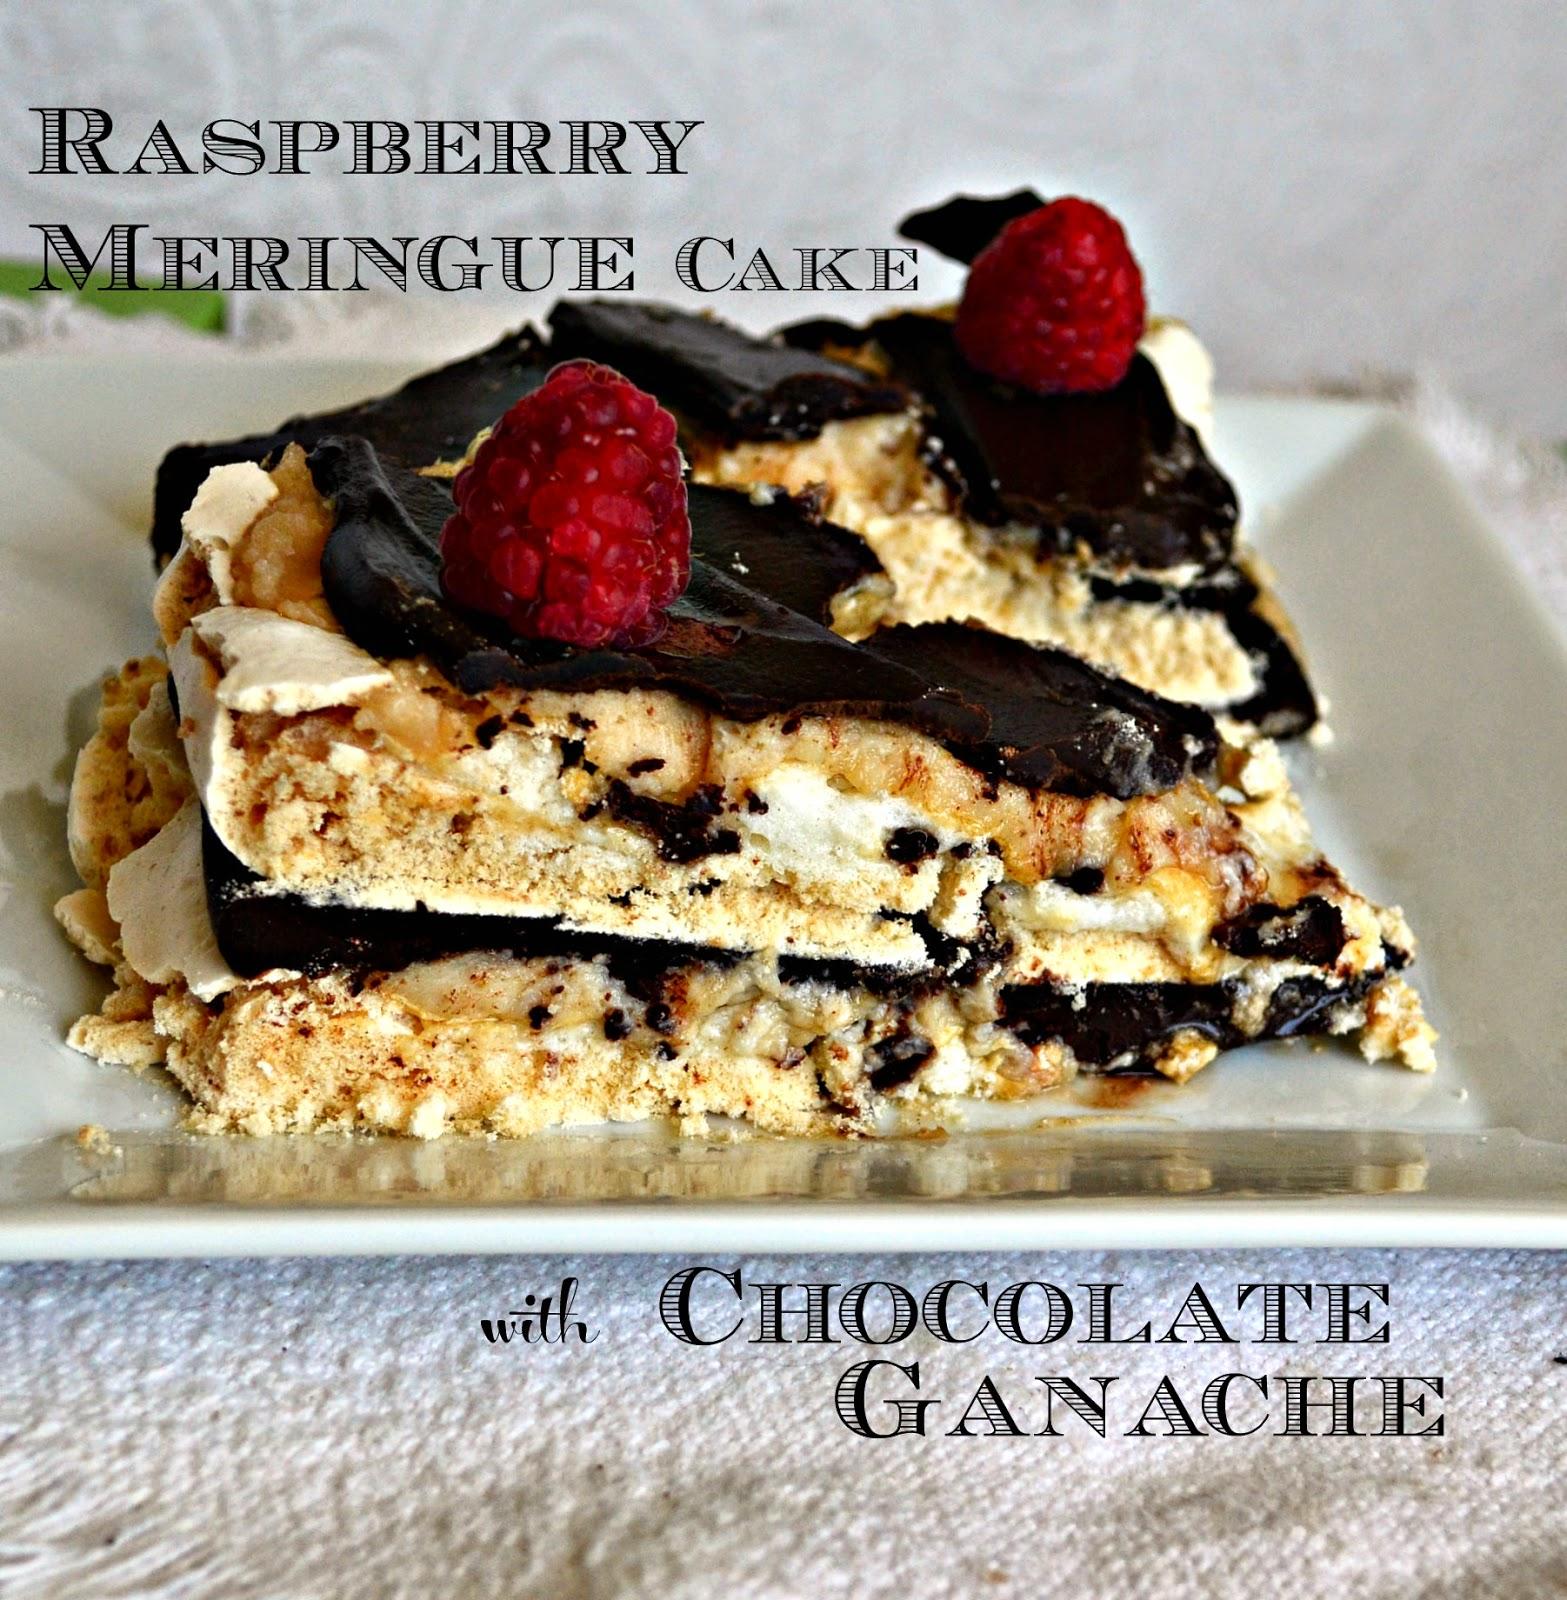 Easy Raspberry Meringue Cake with Chocolate Ganache - This